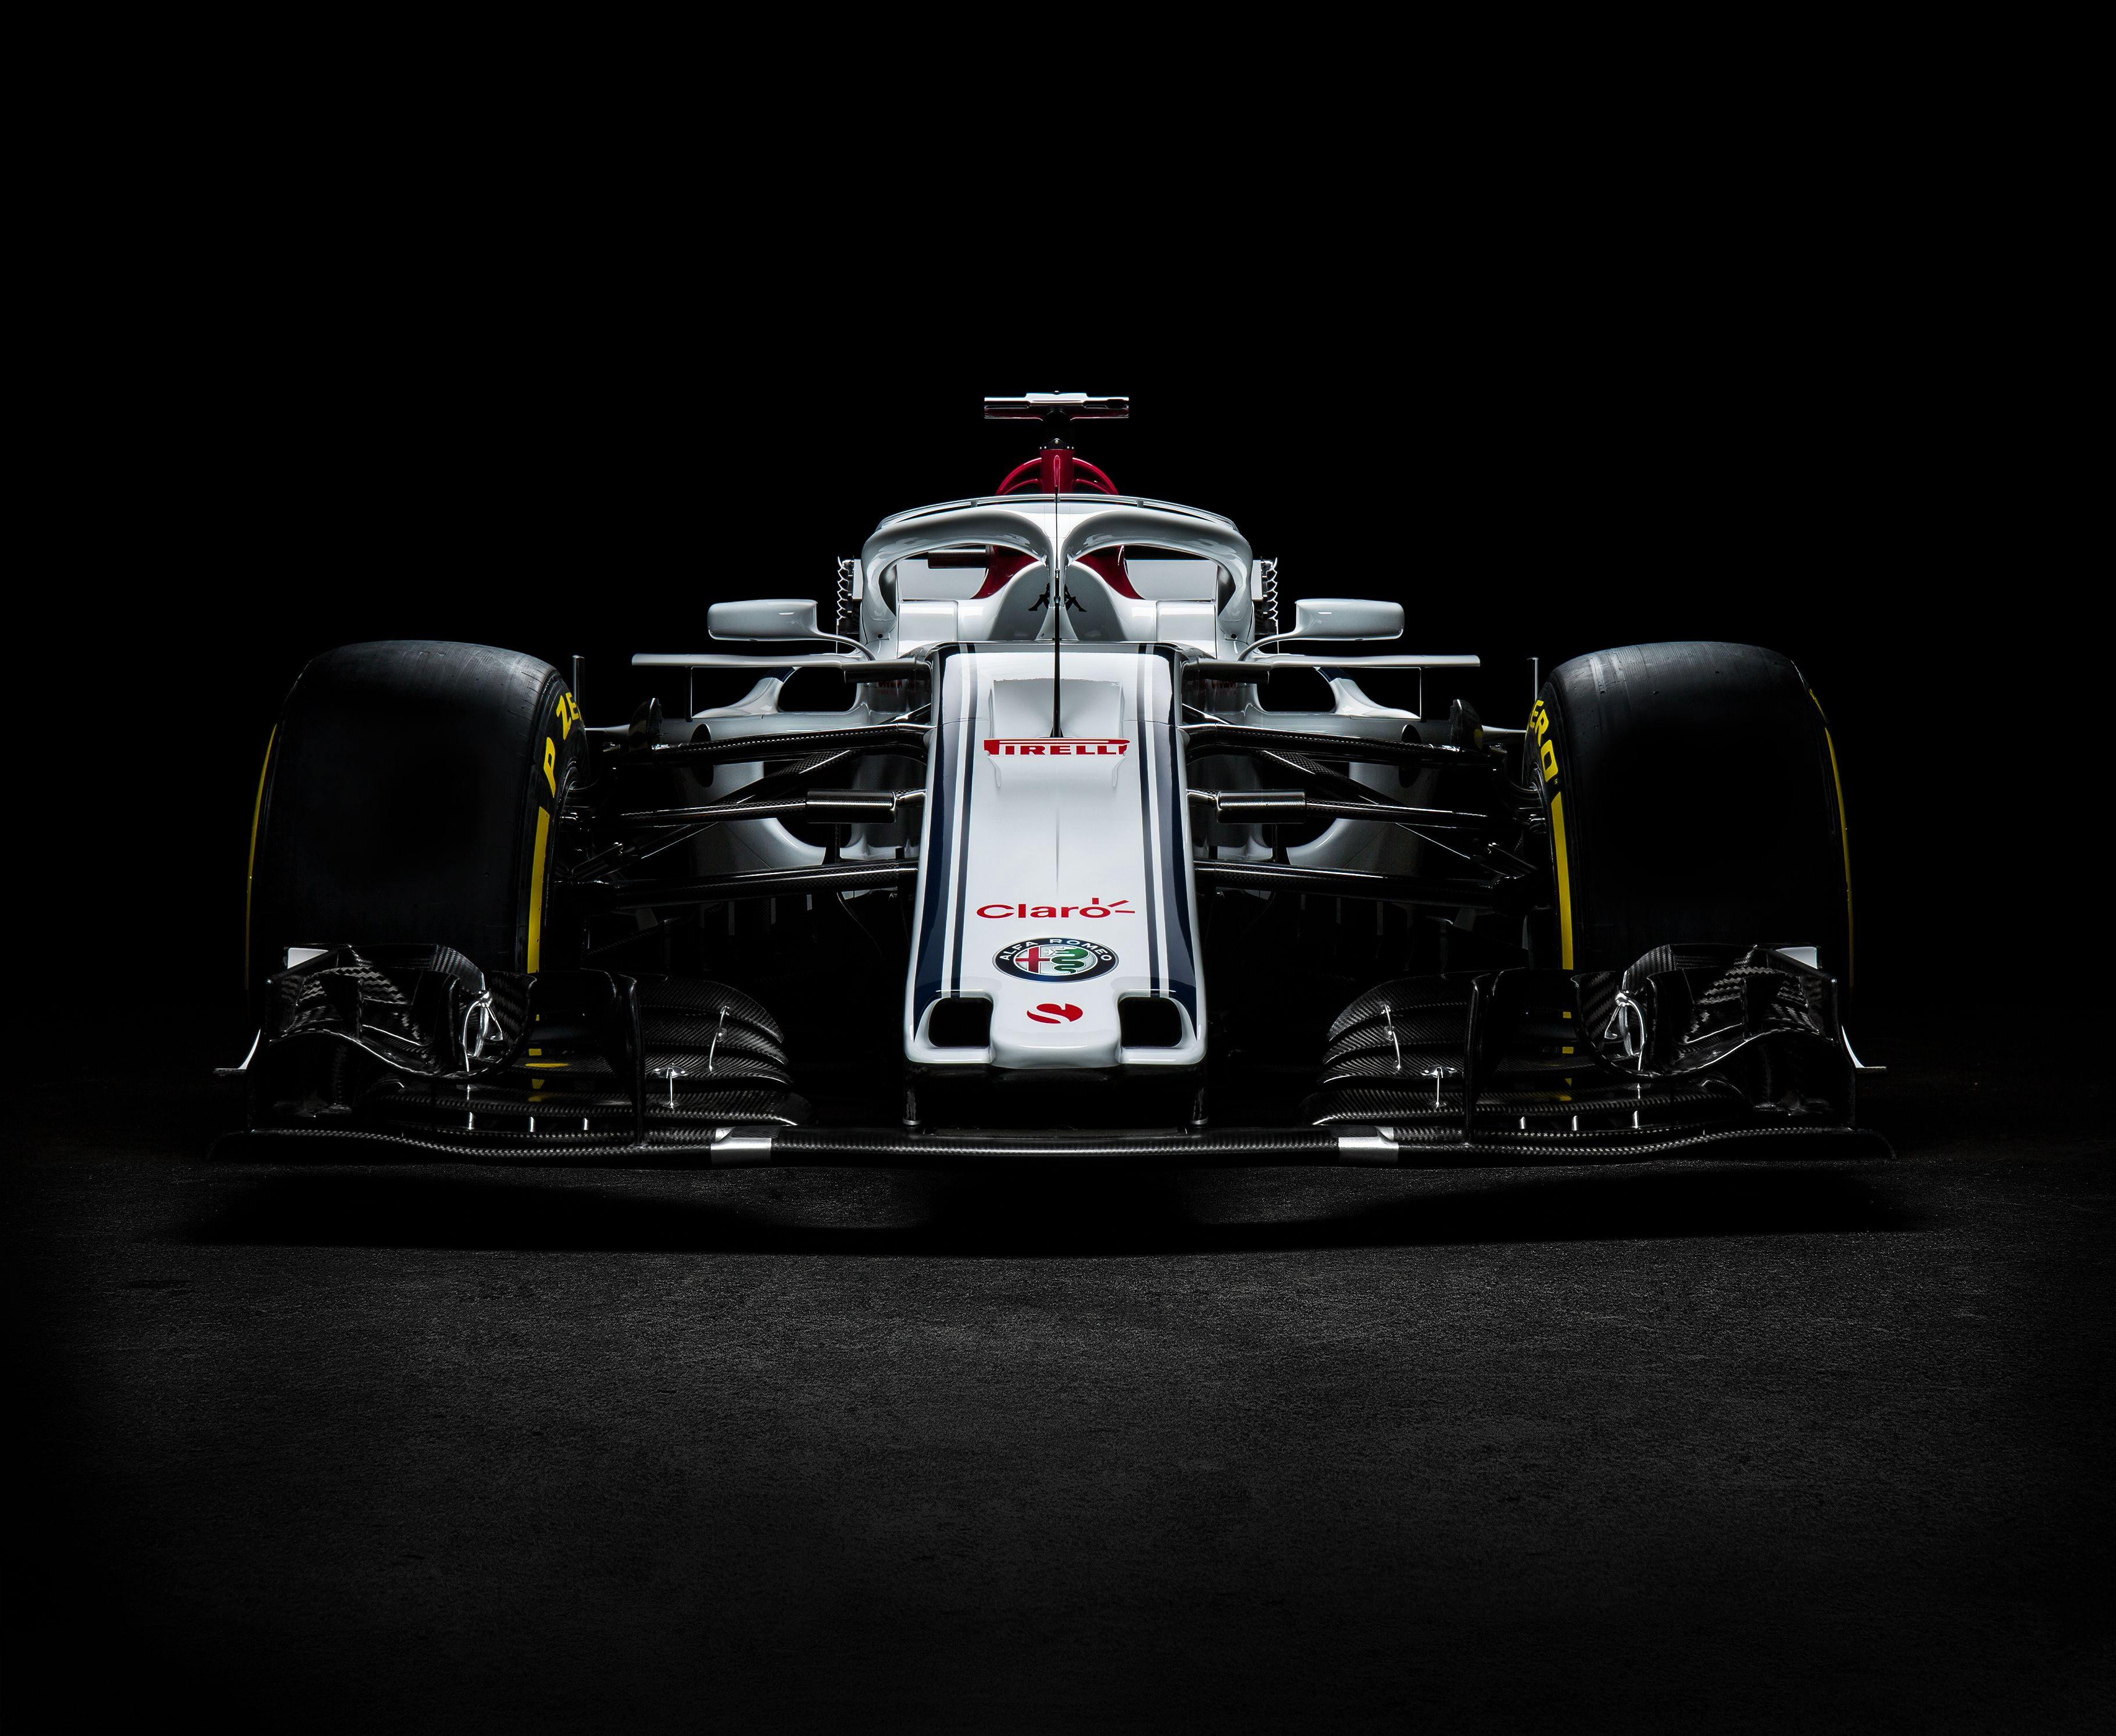 Alfa Romeo Sauber F1 Front View Car Sports Car Wallpaper Racing